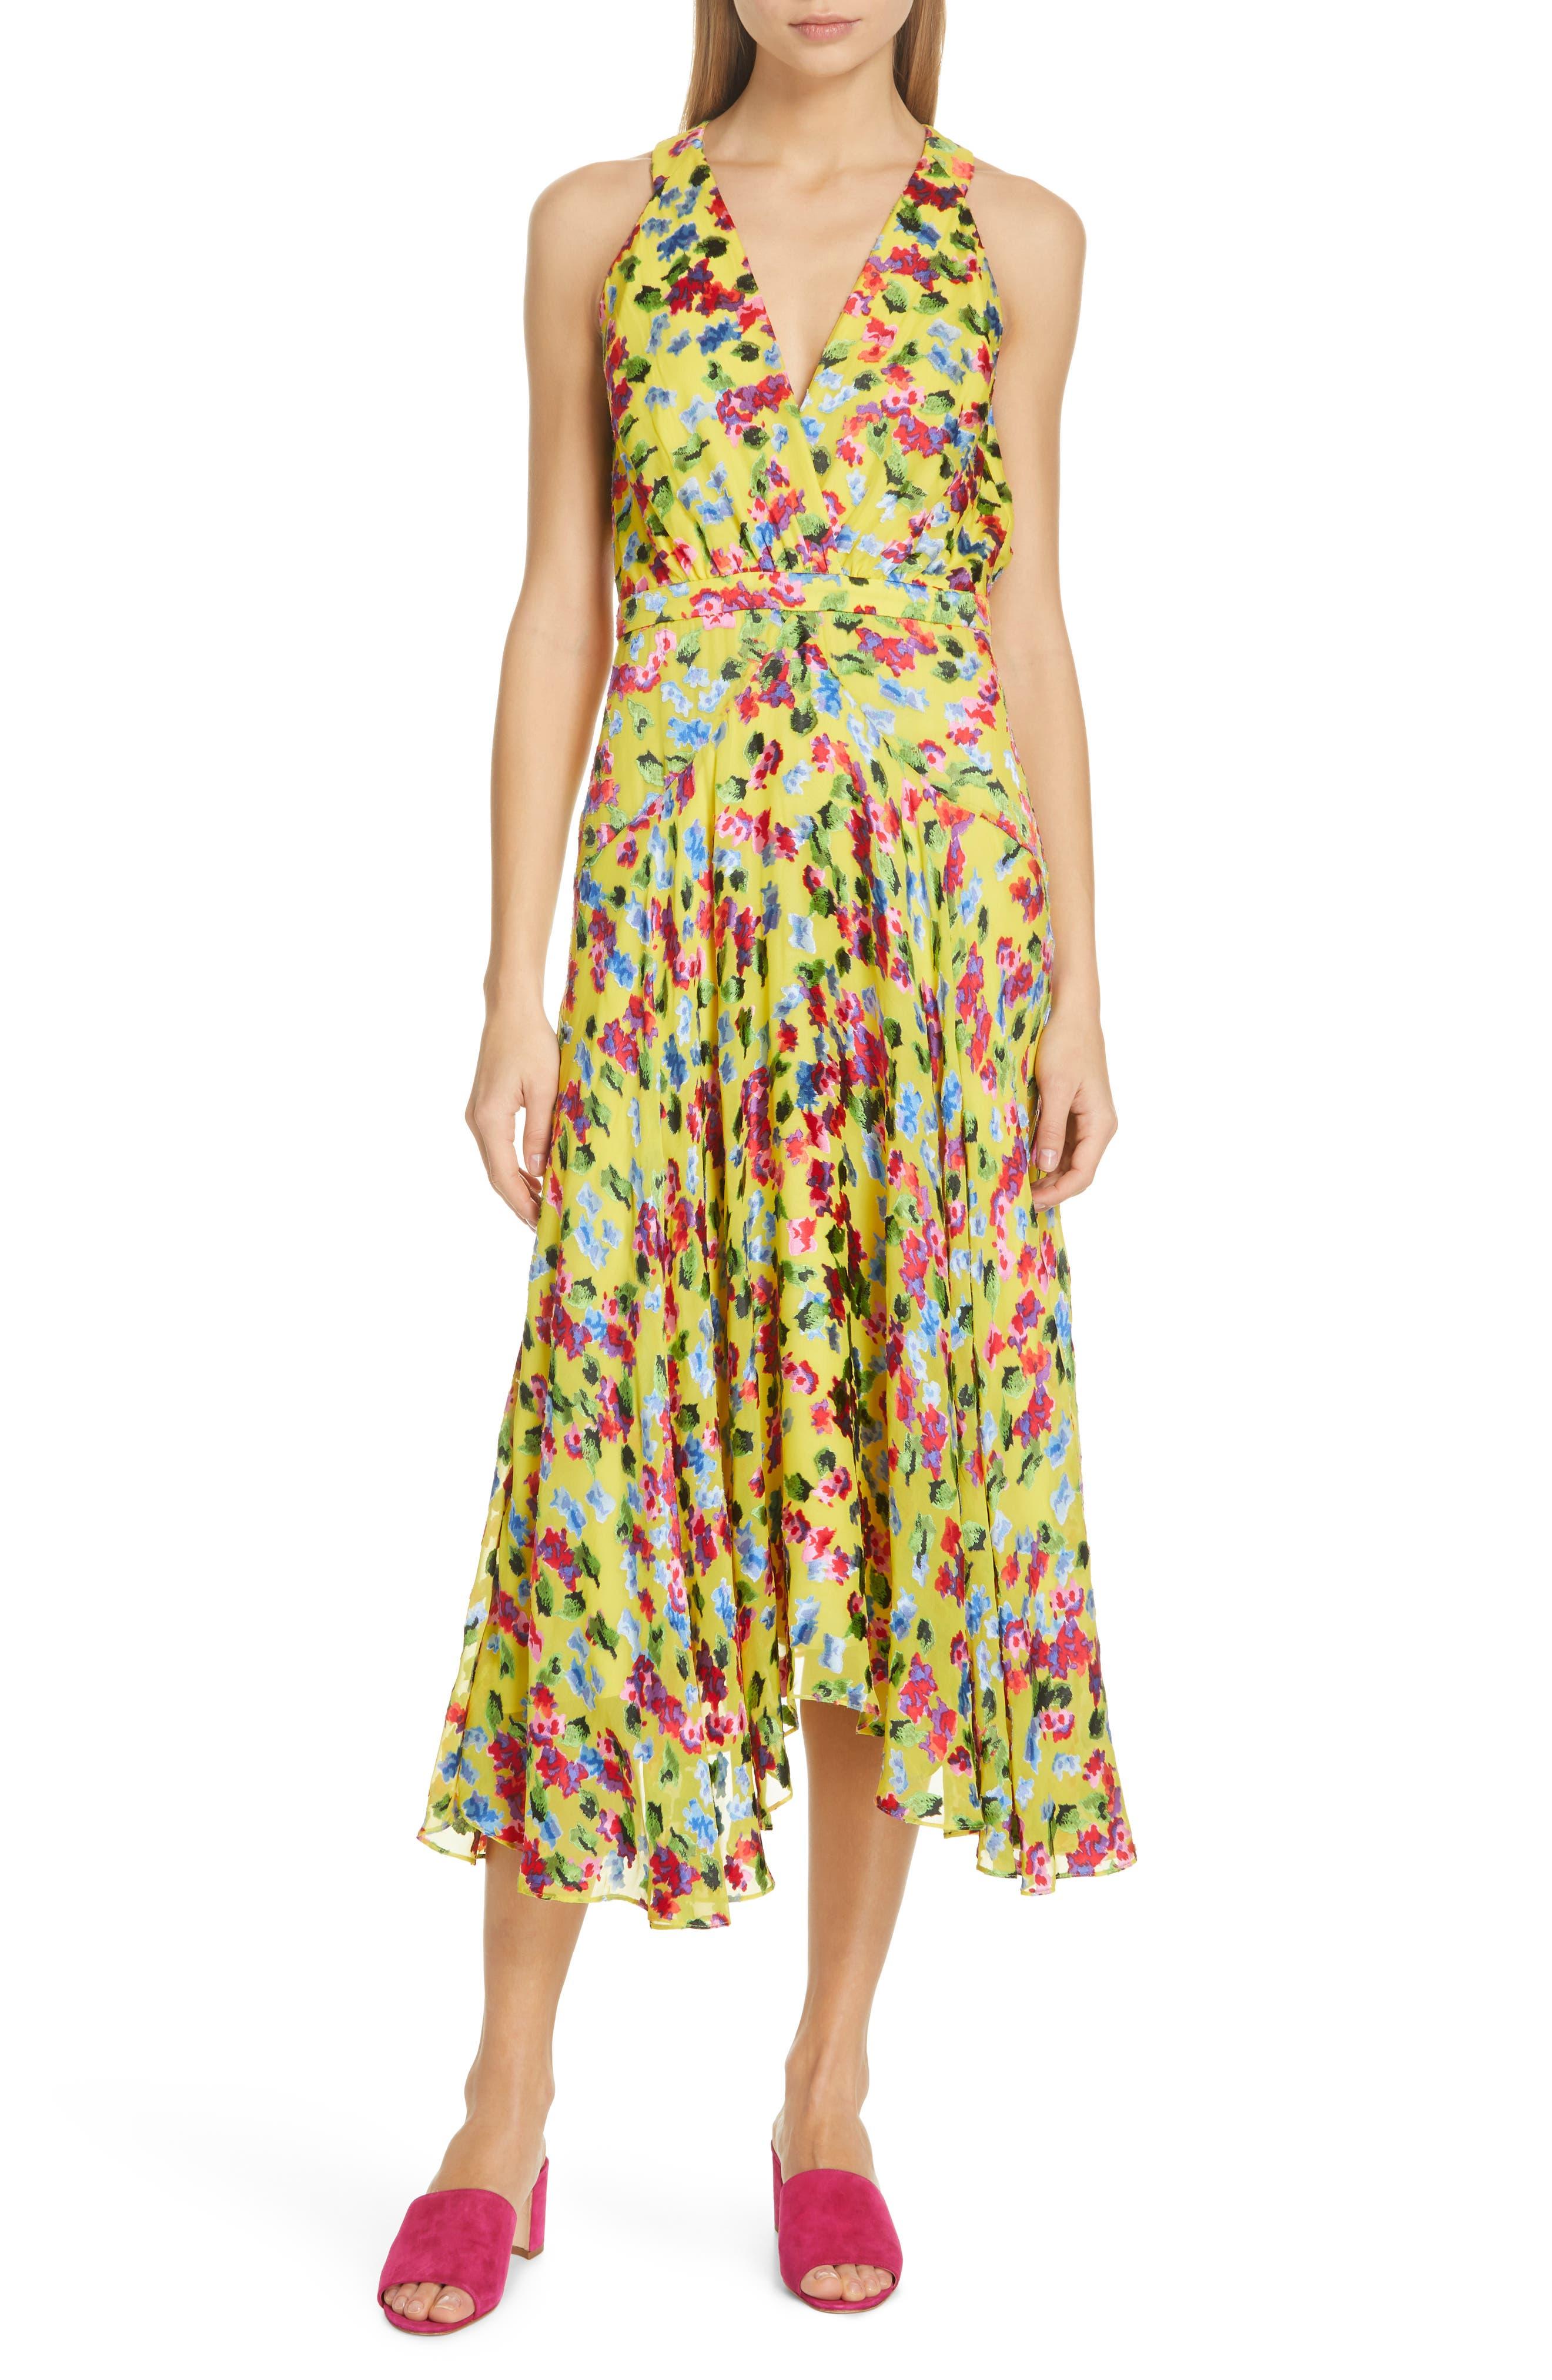 SALONI Rita Floral Print Shark Bite Hem Midi Dress, Main, color, YELLOW GARDENIA